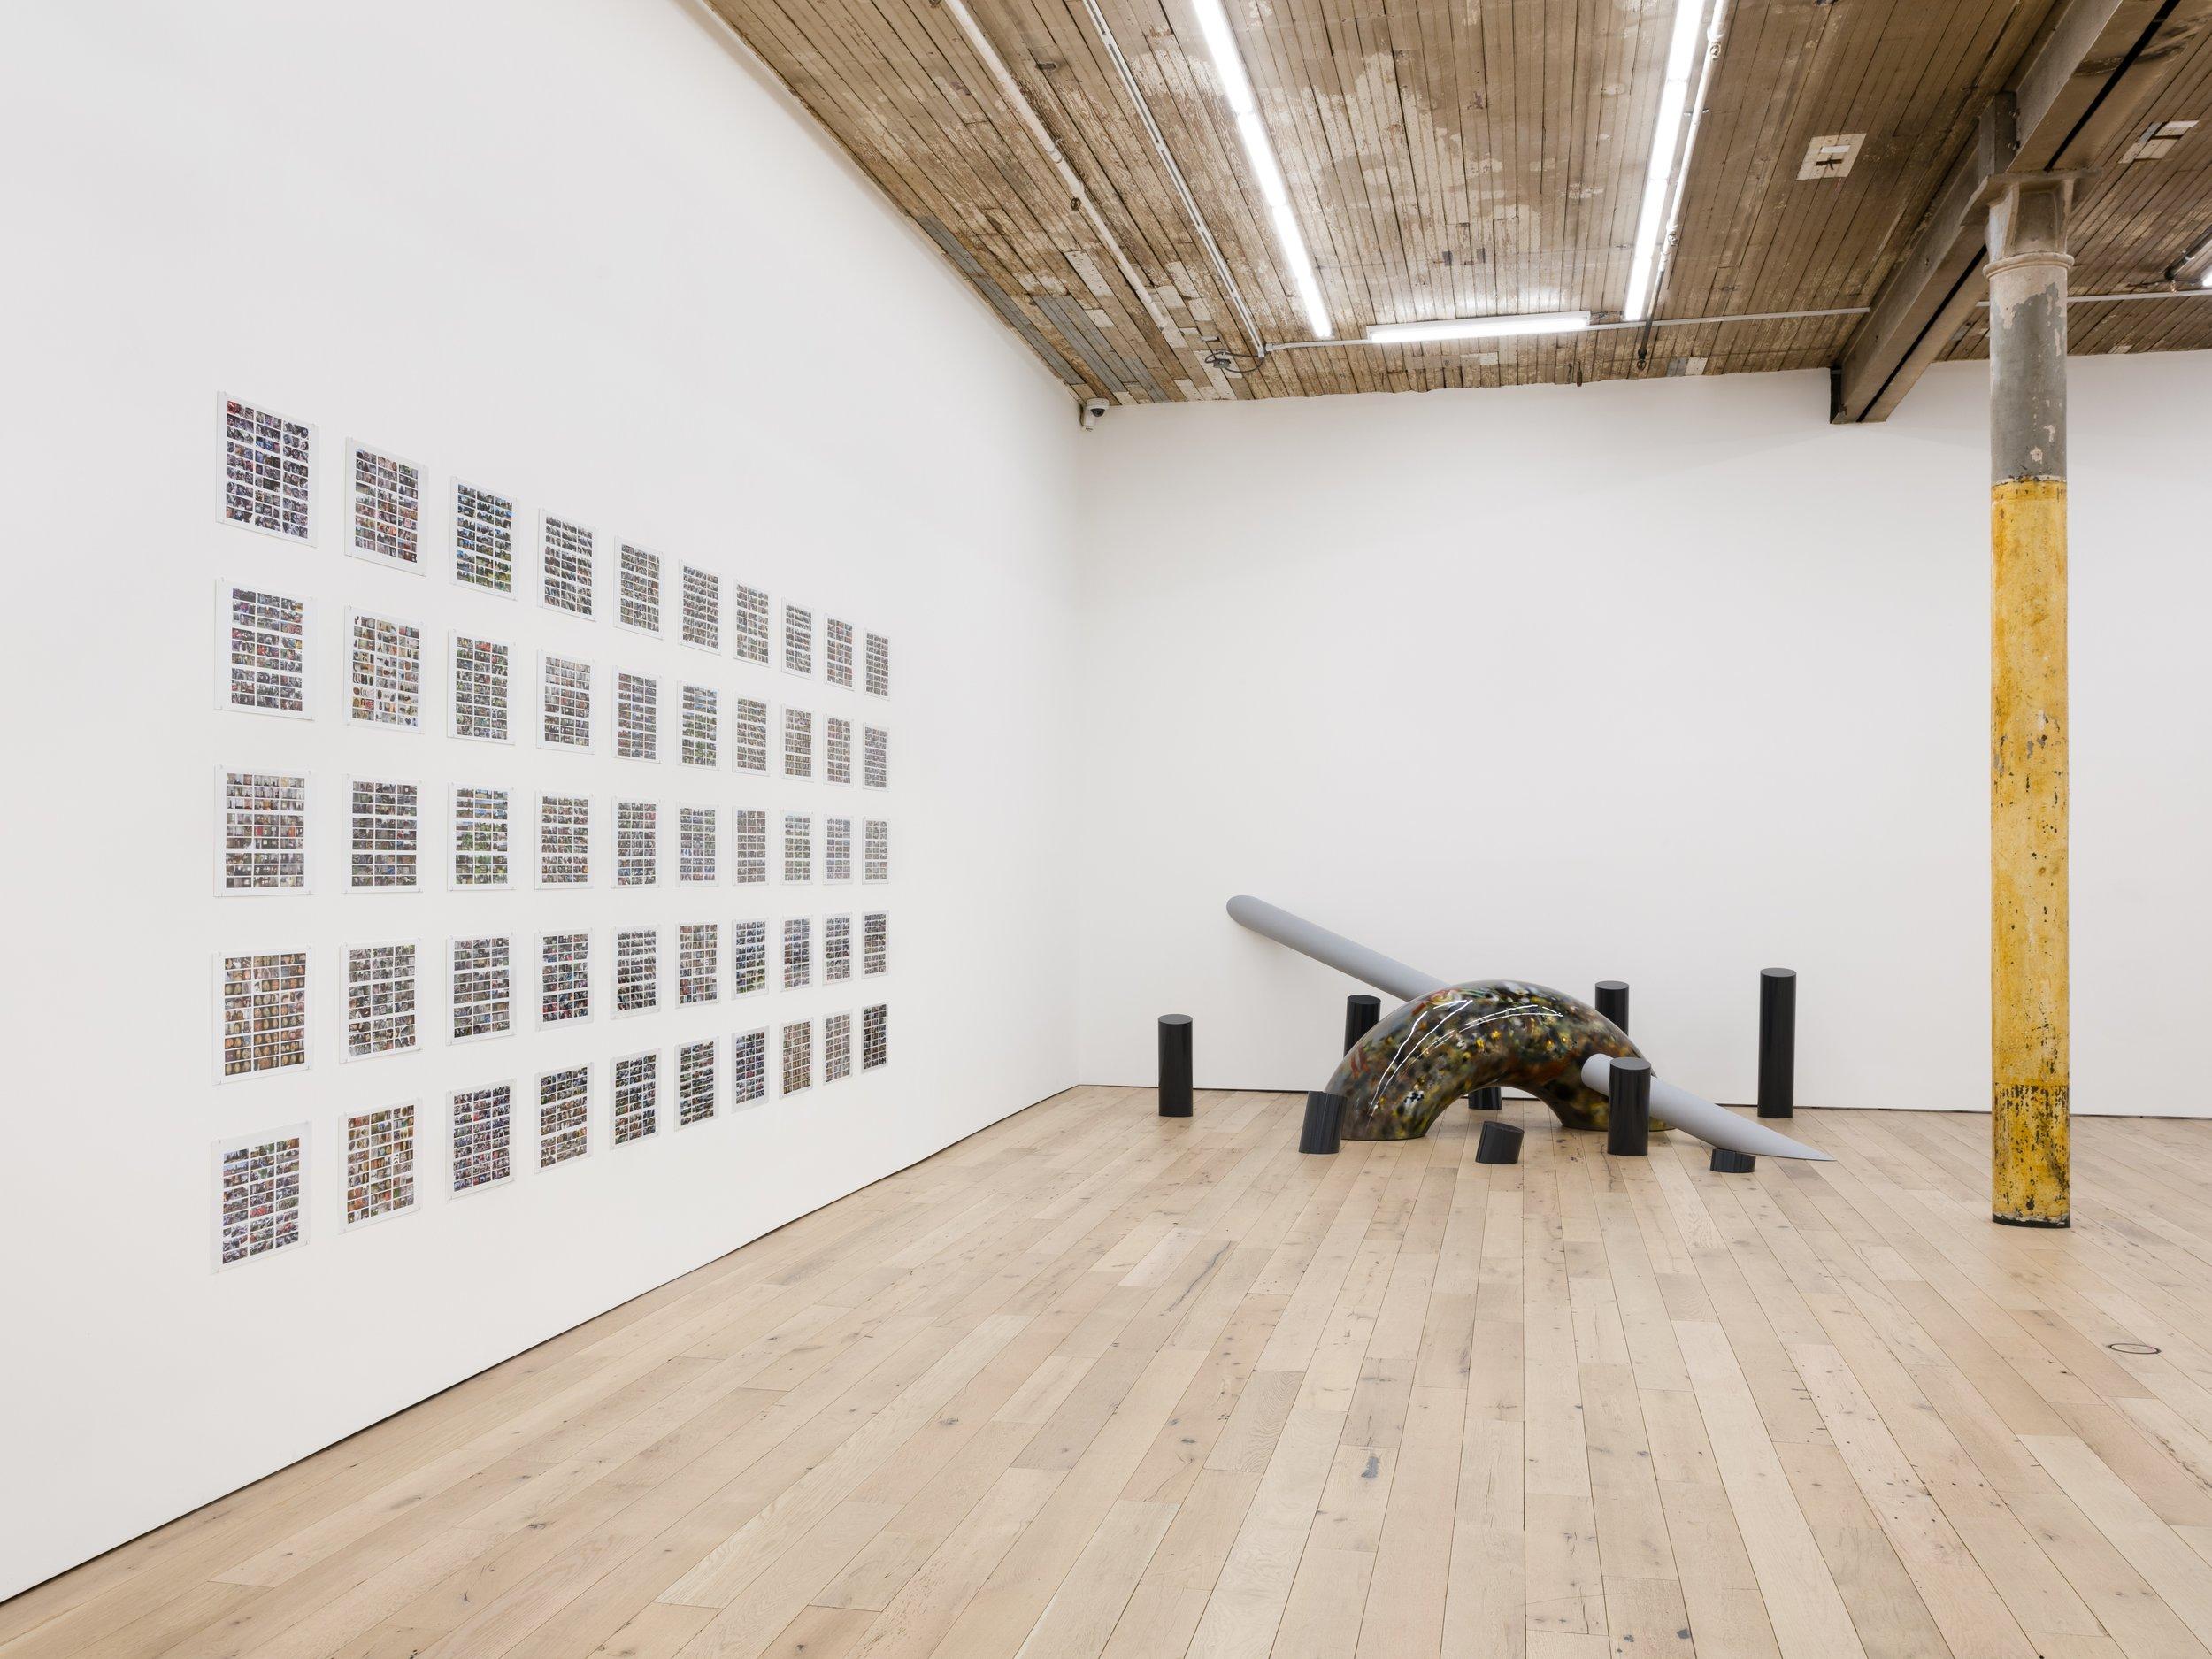 Fall Apart, Martos Gallery, 2019, Installation View 3